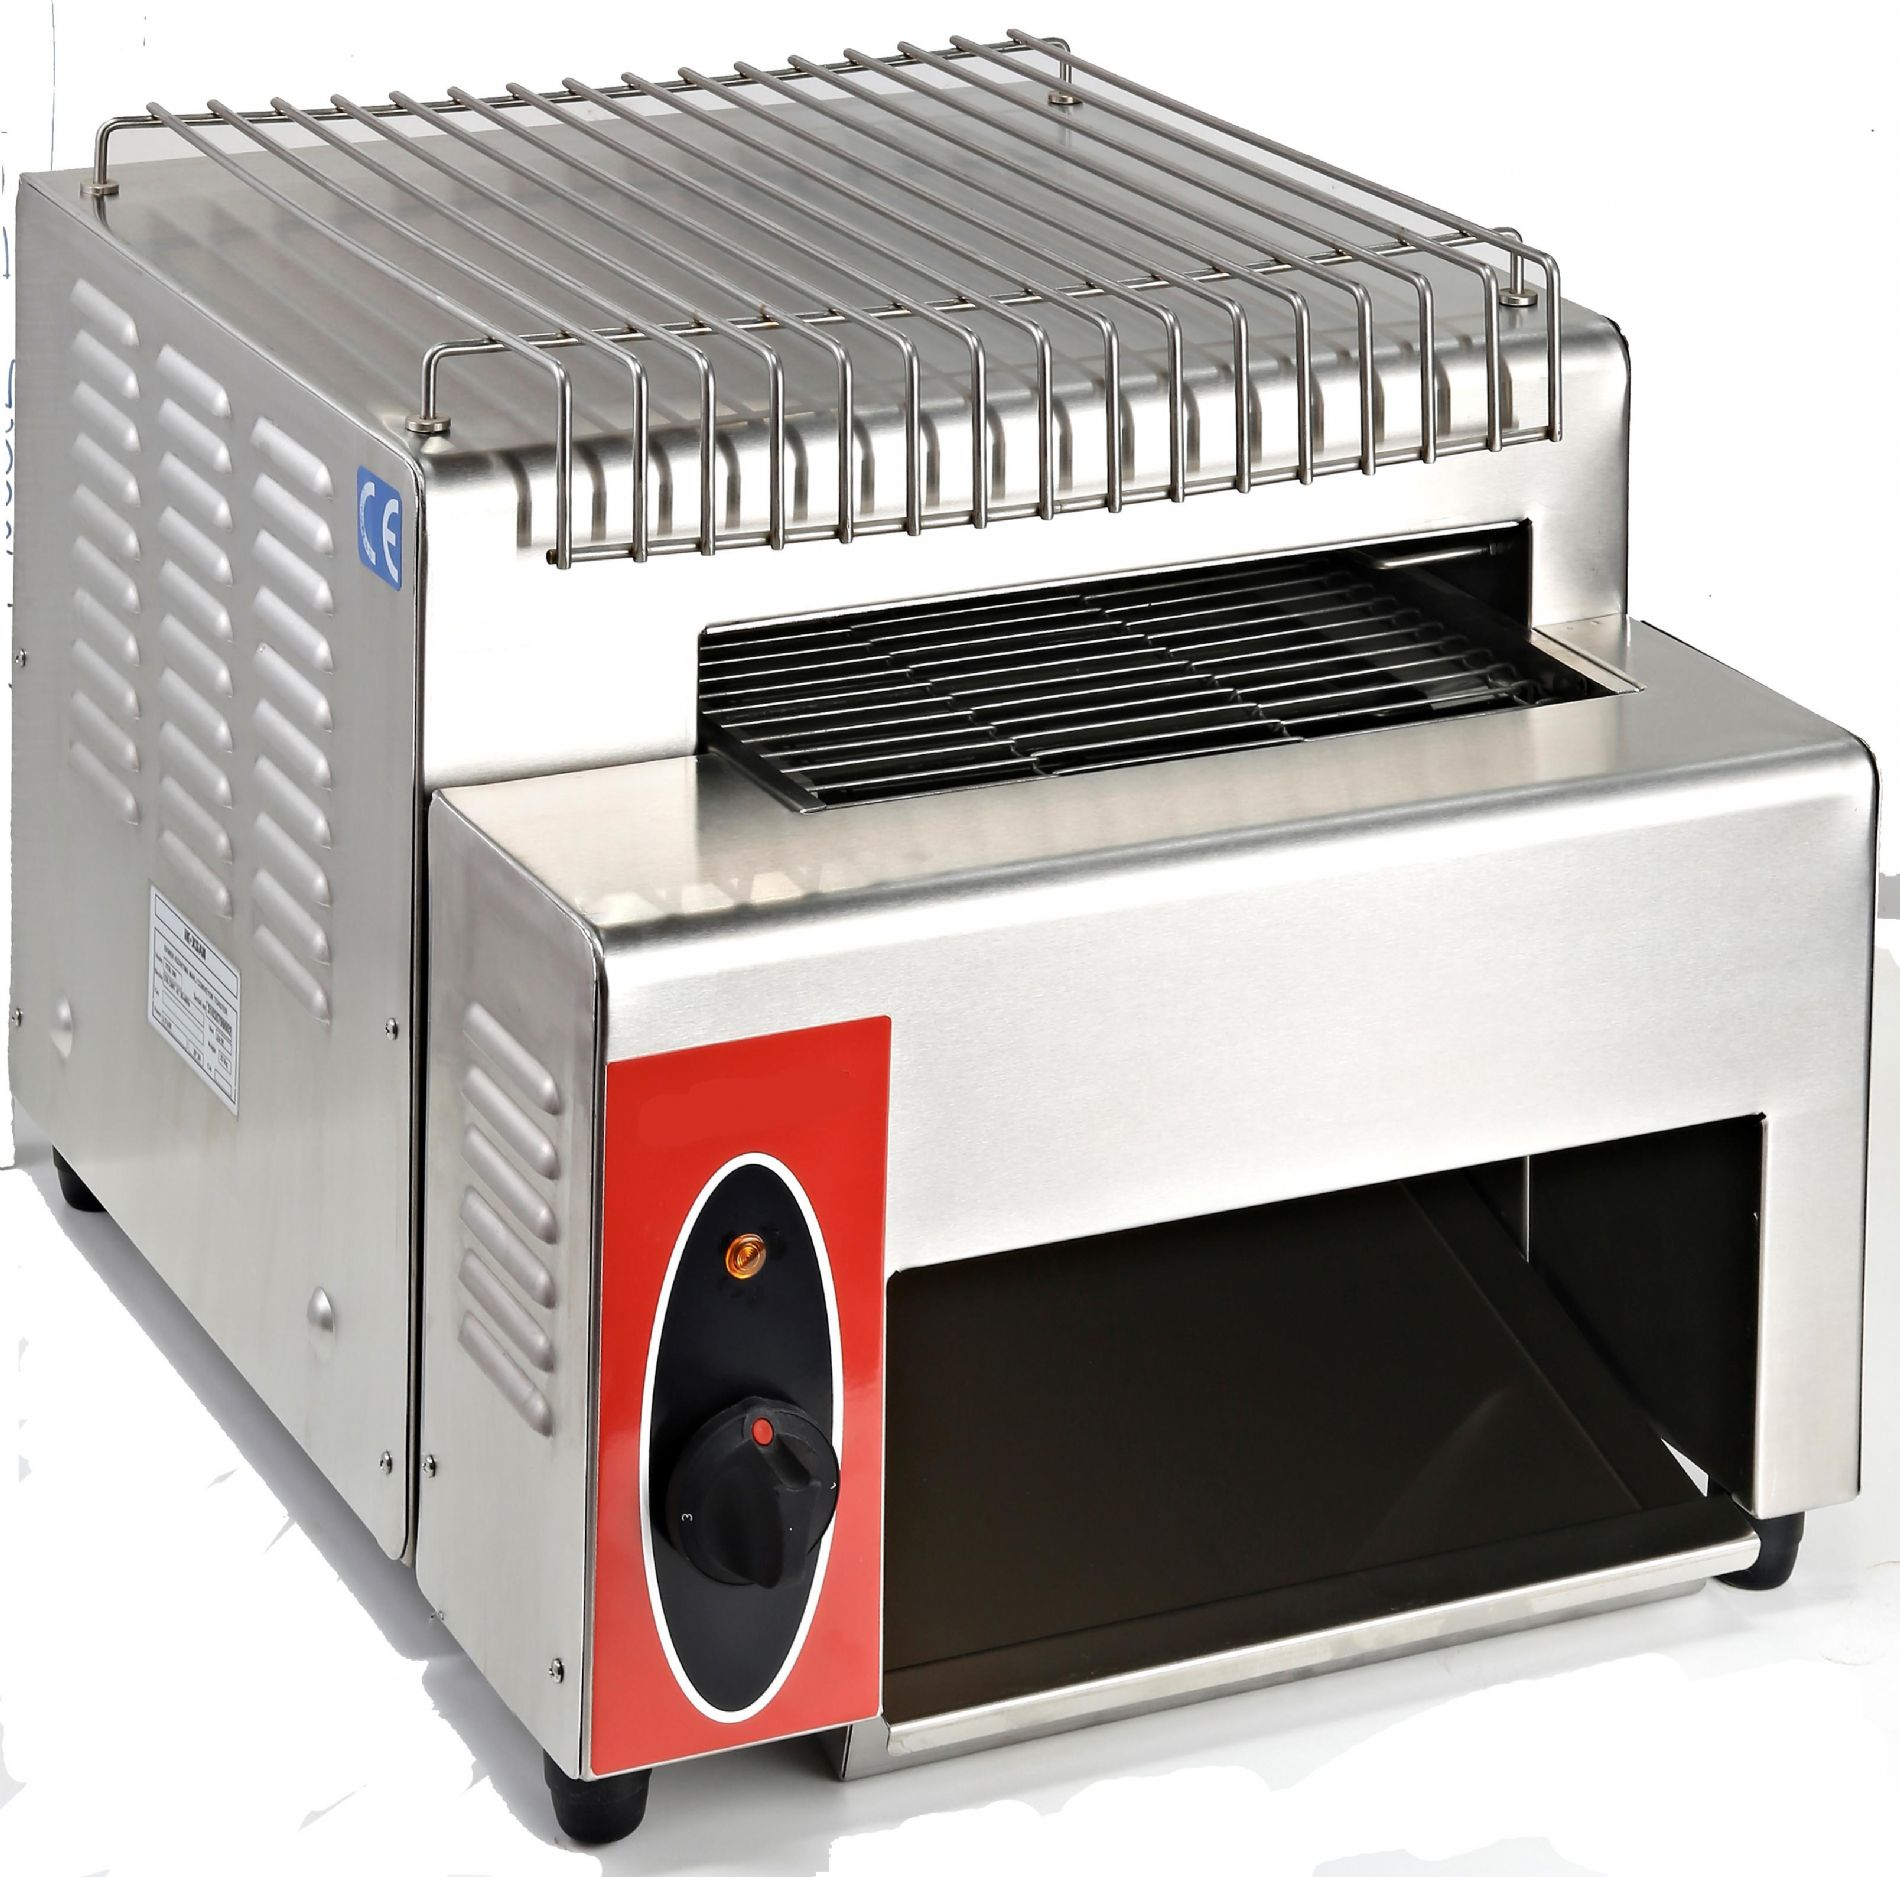 Electric Conveyor Toaster ~ Conveyor toaster electric fnf metal